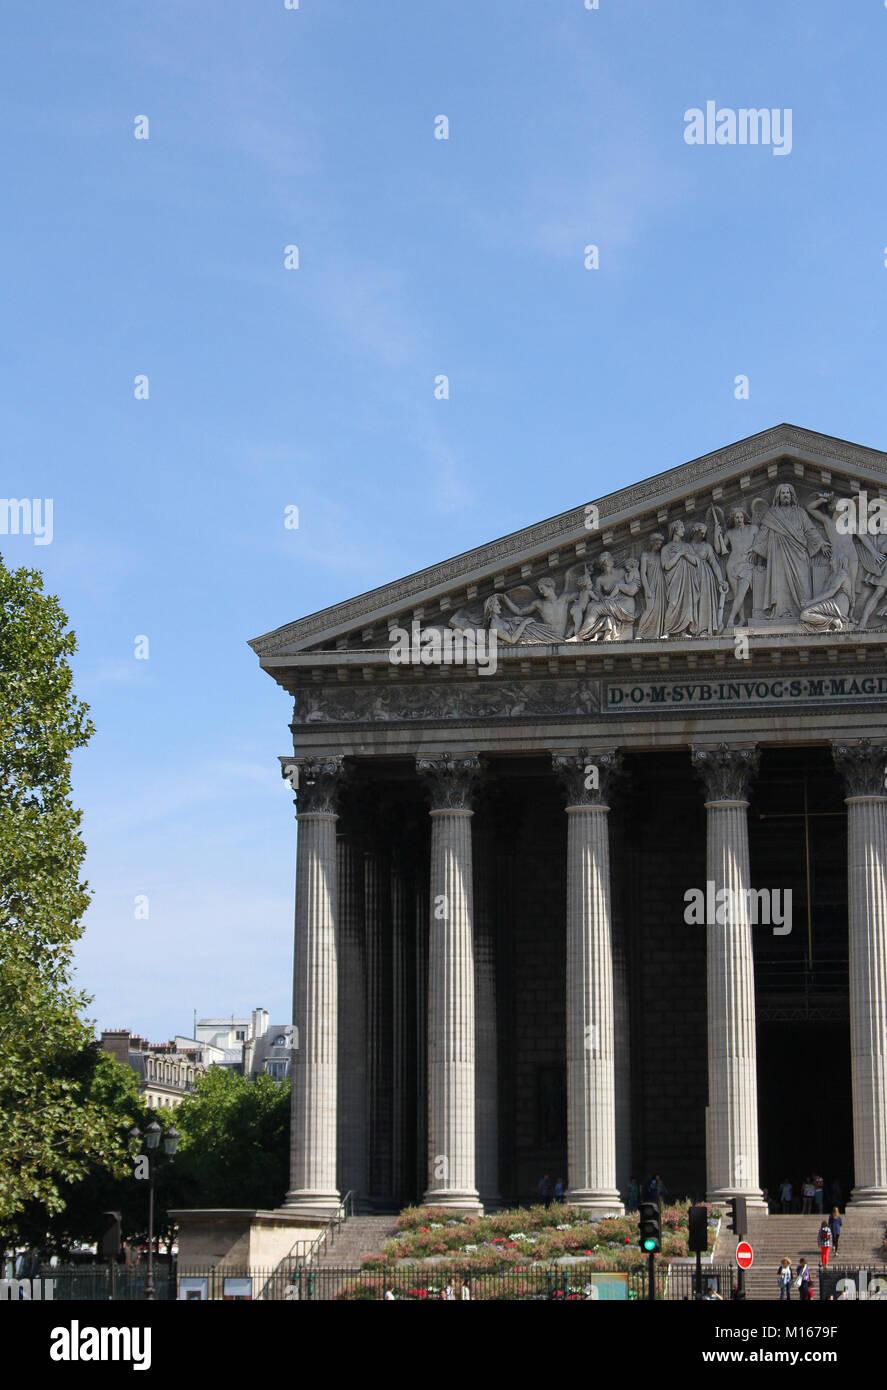 Front entrance of the L'église Sainte-Marie-Madeleine (La Madeleine / Madeleine Church), Paris, France. Stock Photo